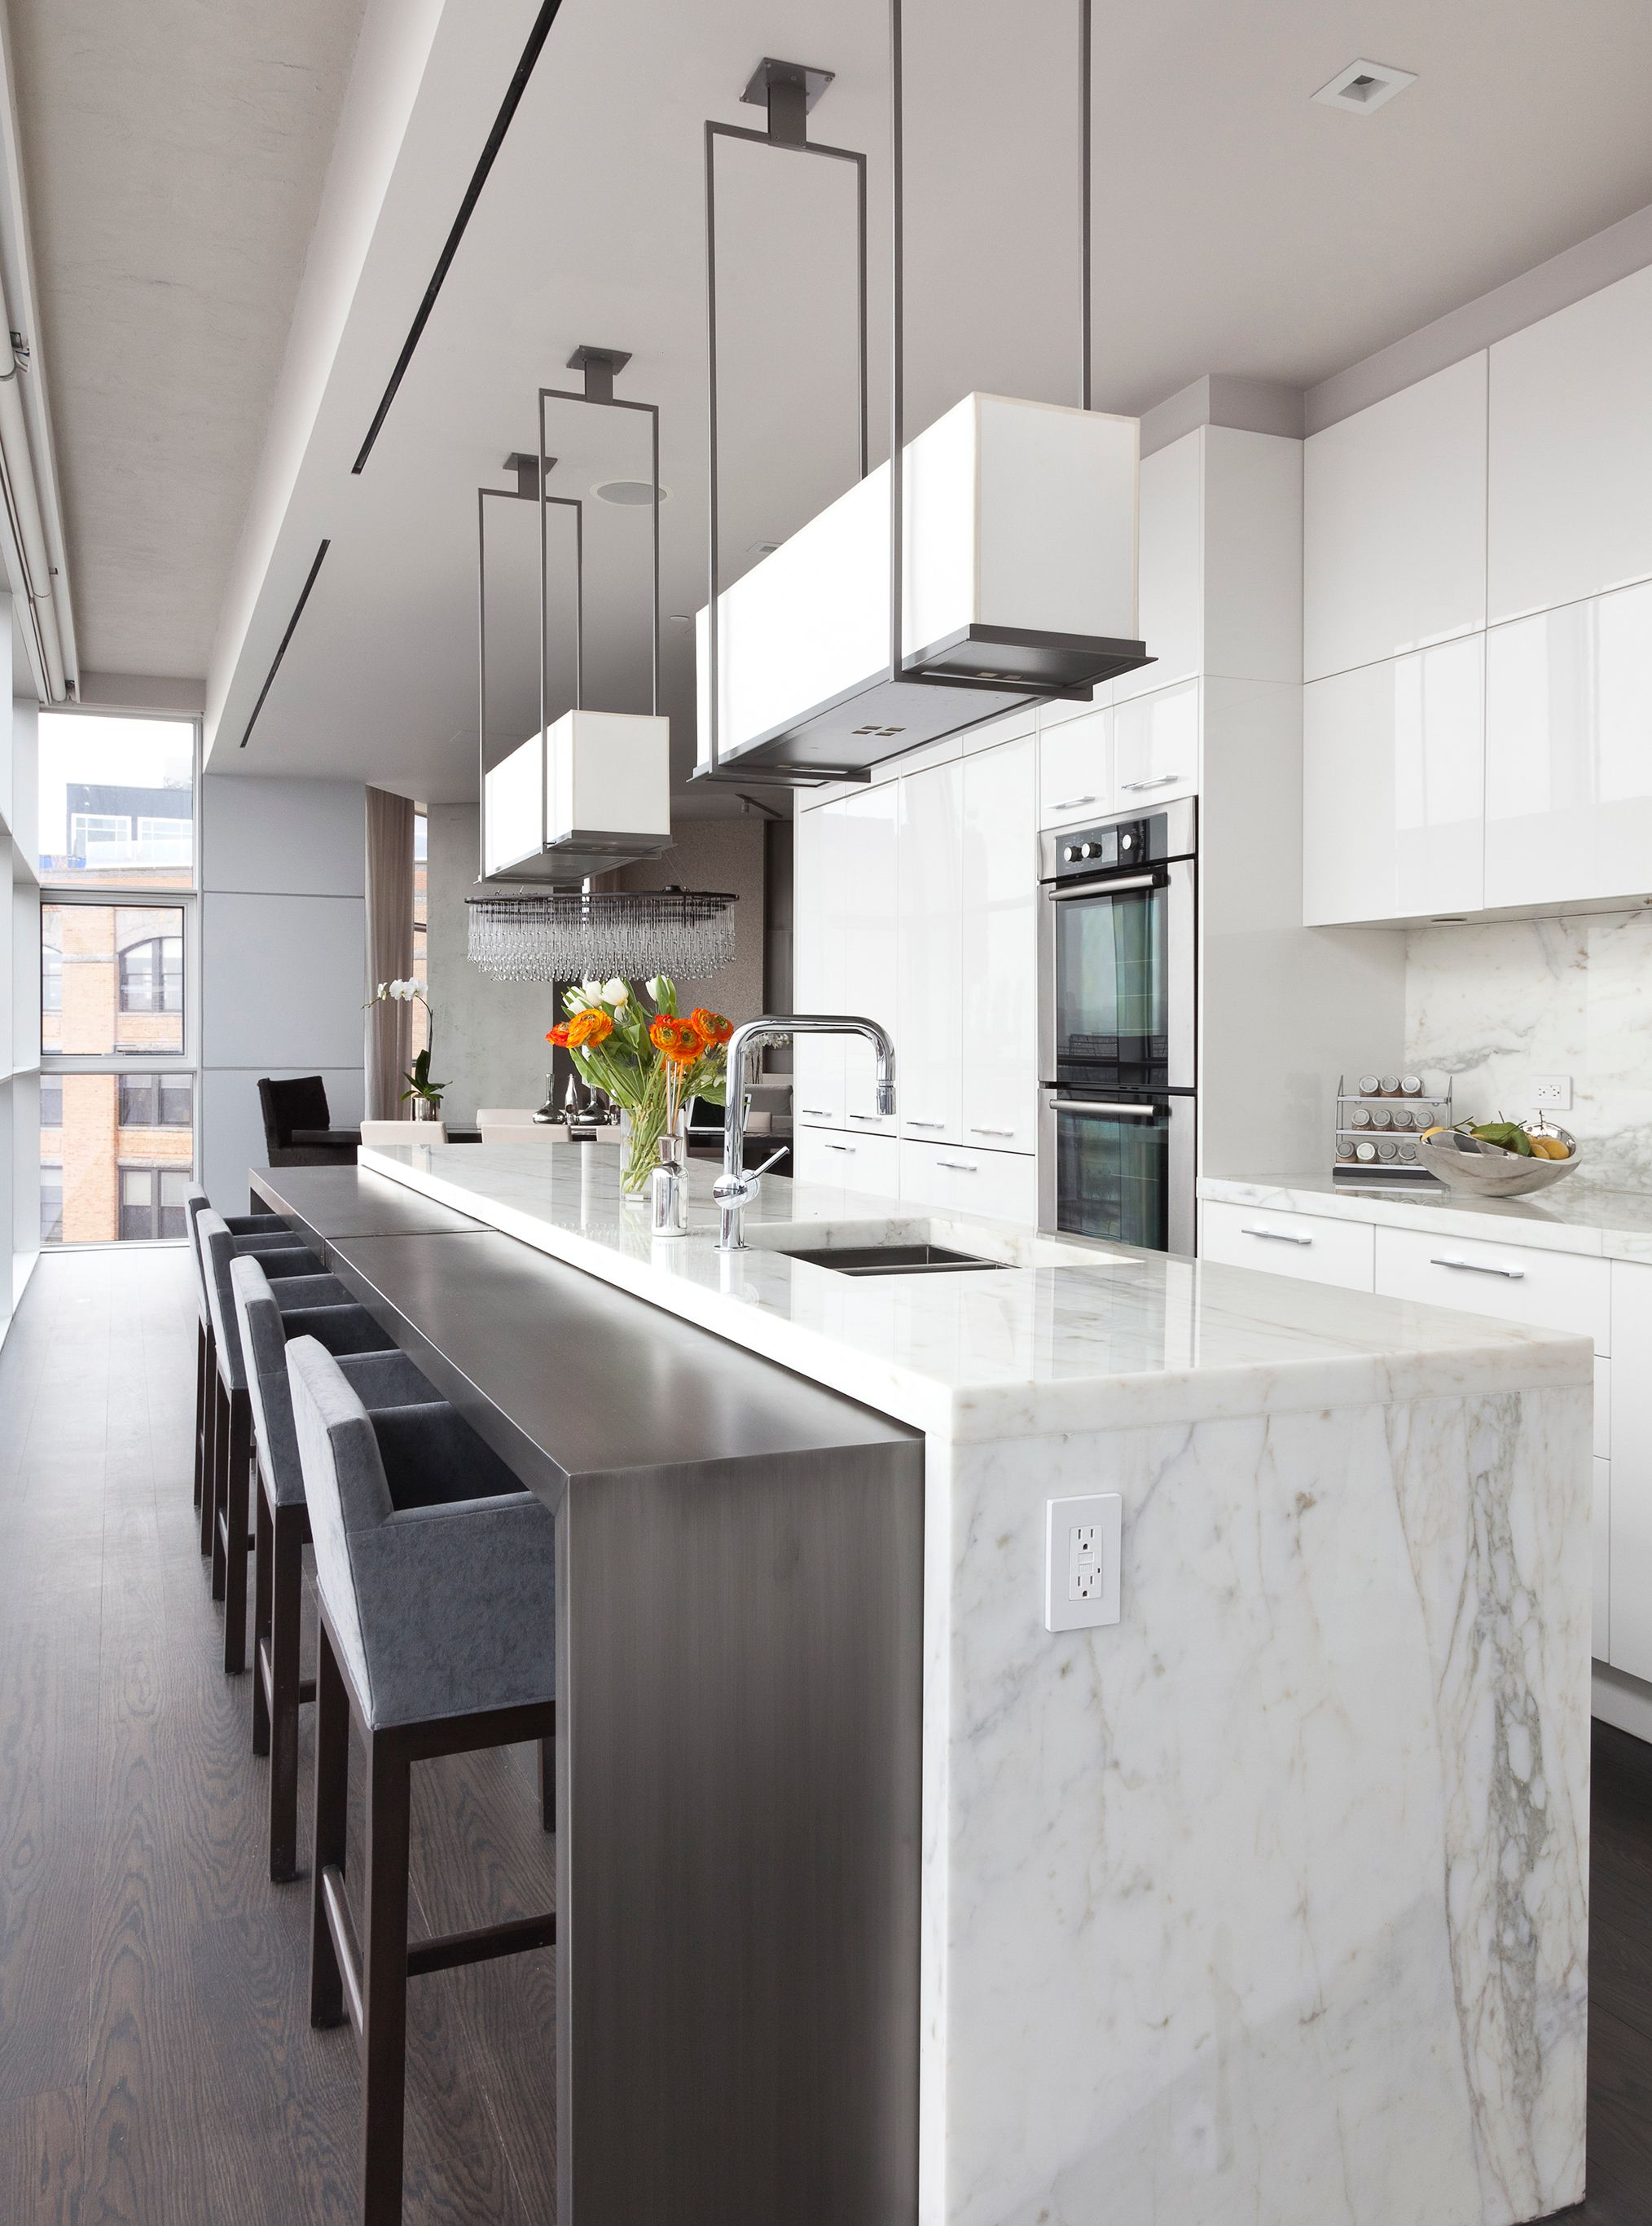 Tribeca luxury penthouse interior design by Purvi